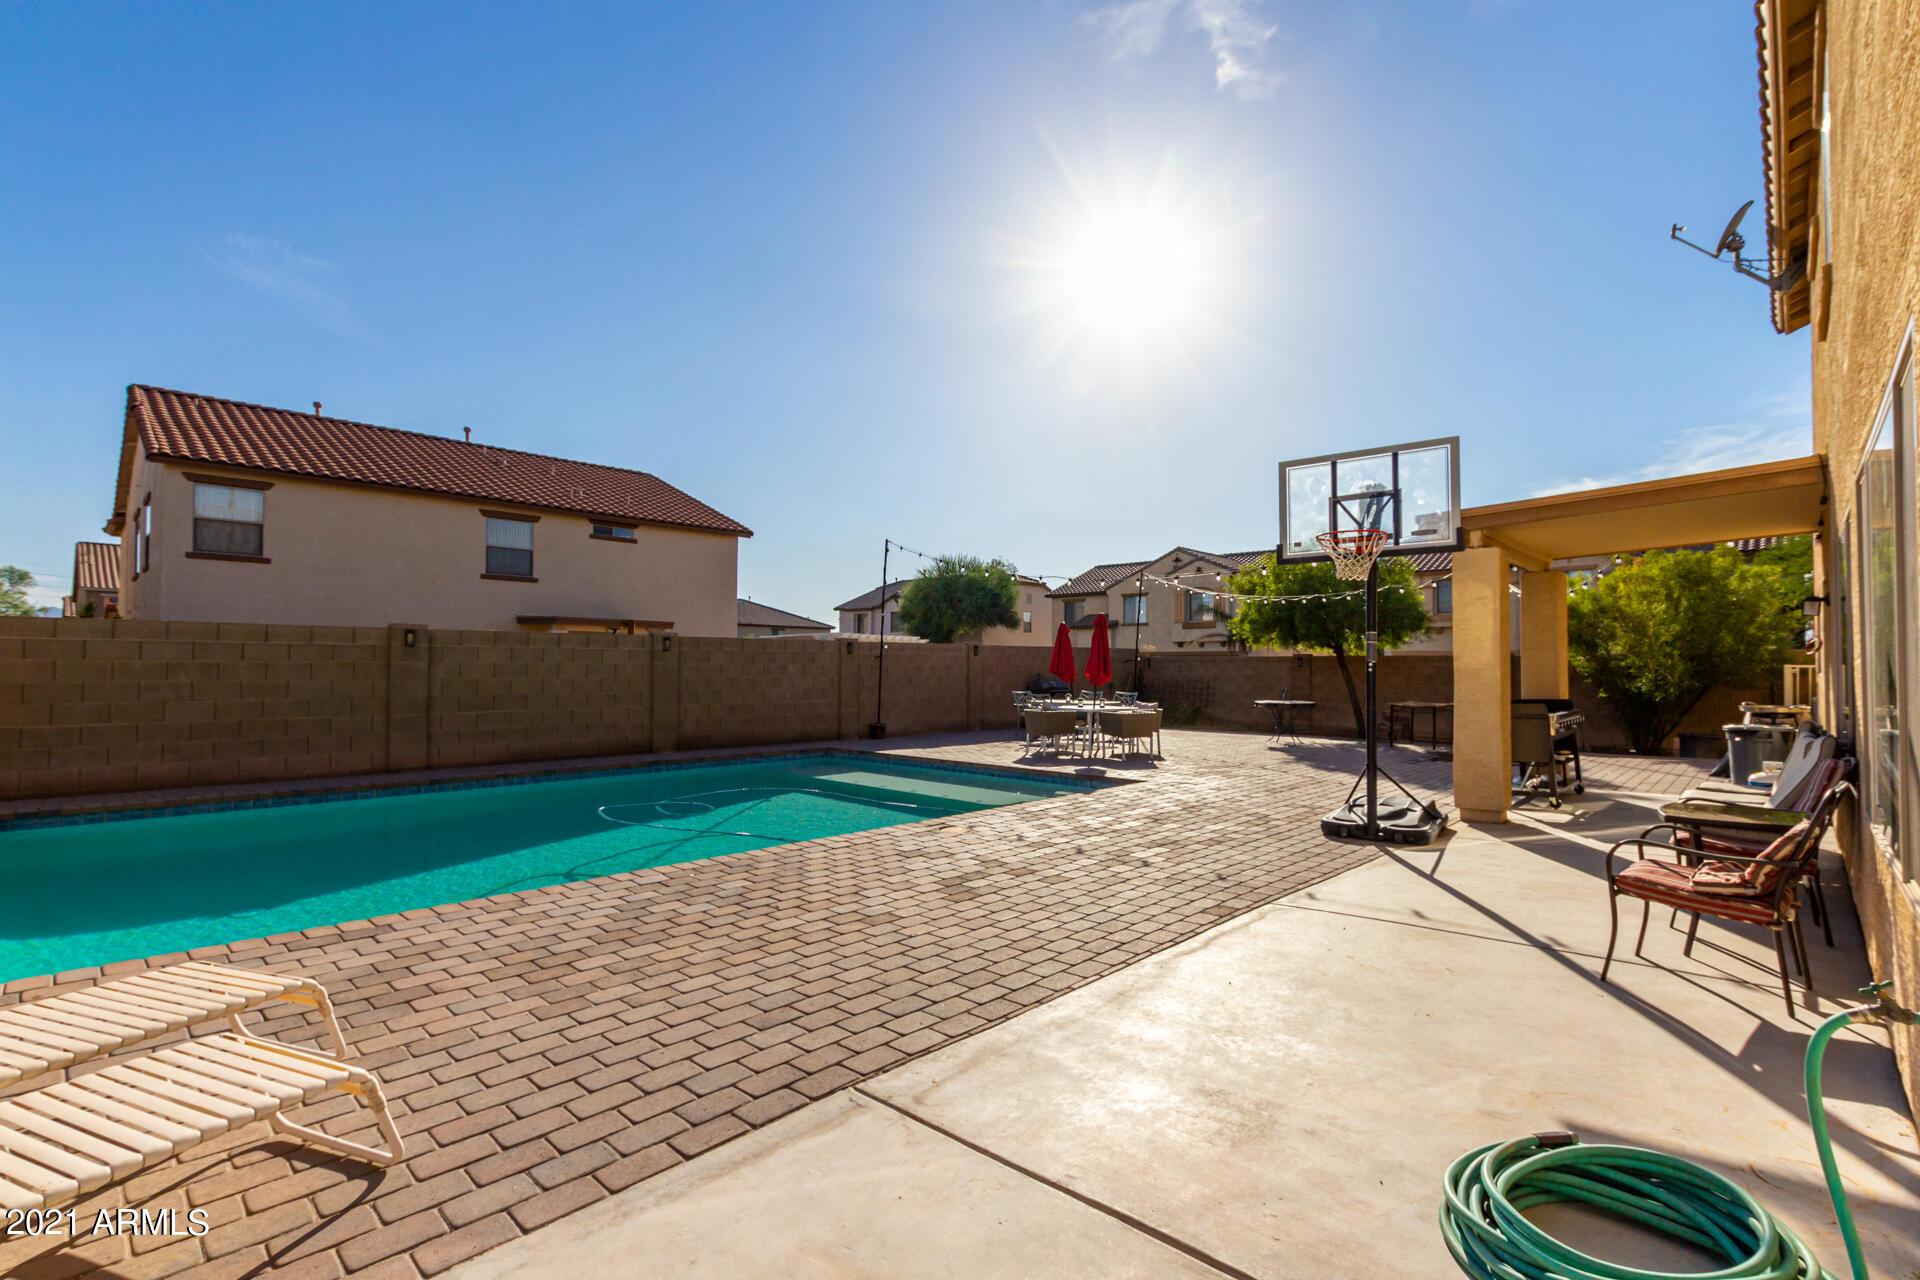 MLS 6310679 11883 W TONTO Street, Avondale, AZ 85323 Avondale AZ Glenhurst